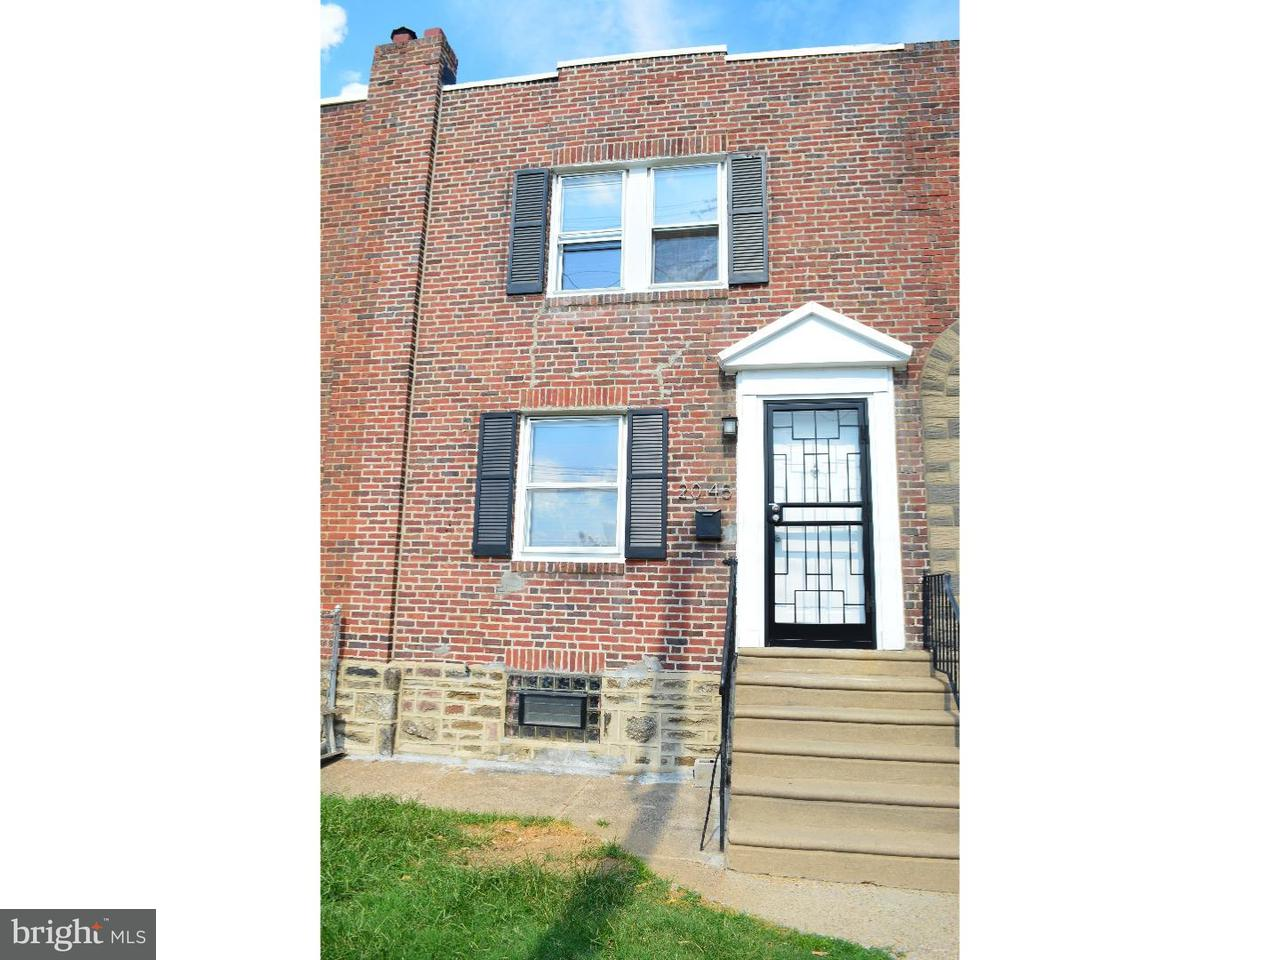 2045 E Sanger Philadelphia, PA 19124